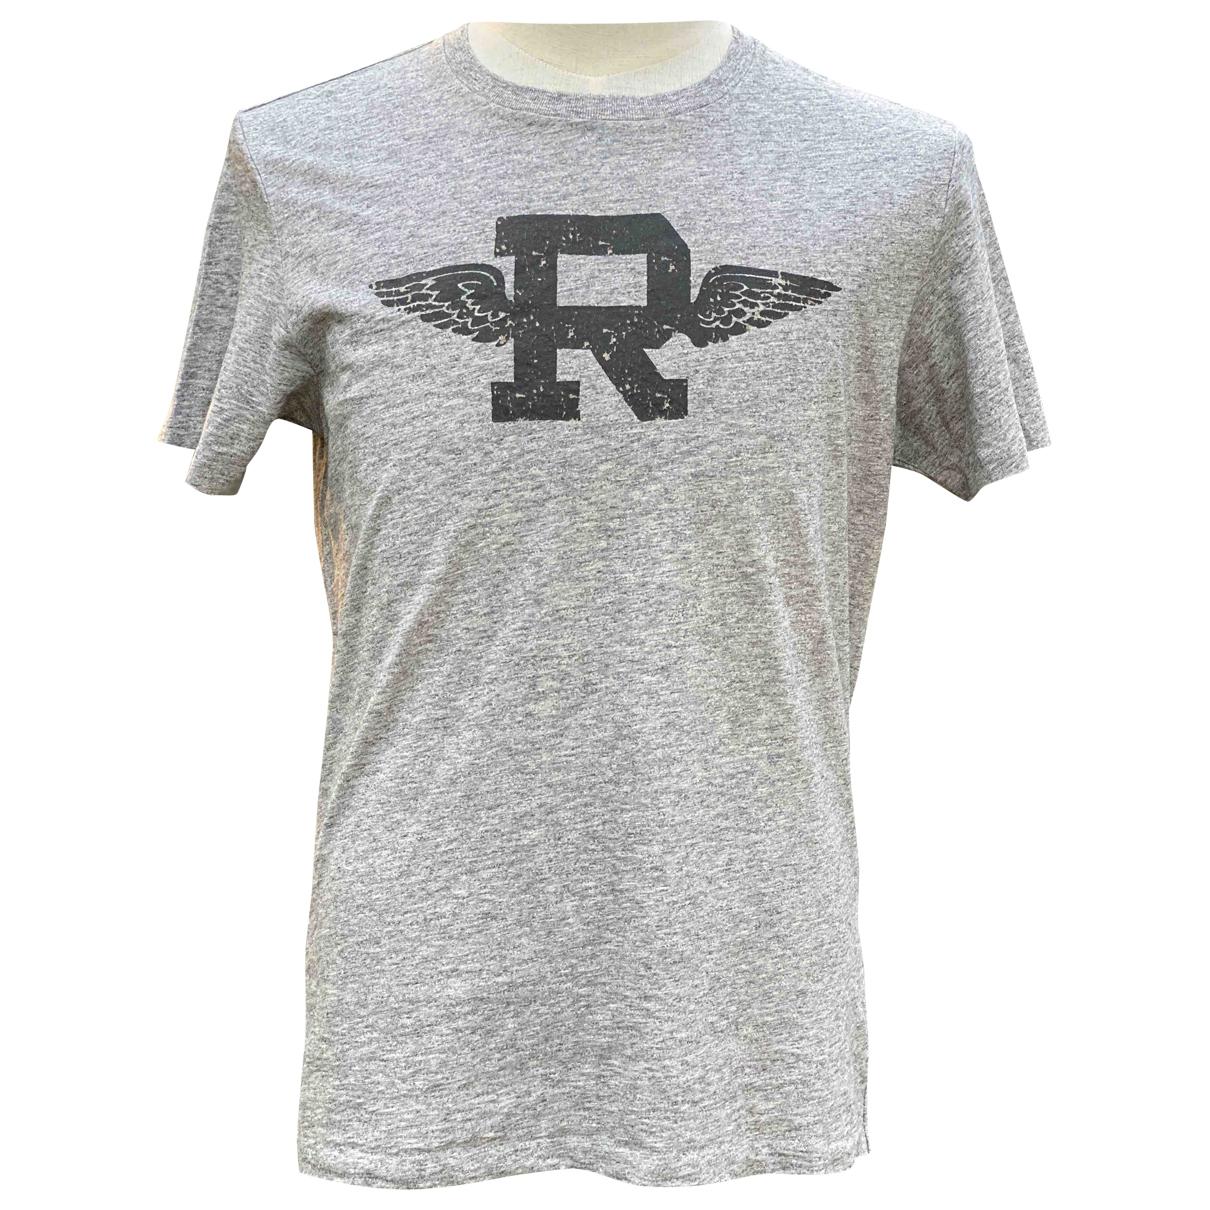 Rugby Ralph Lauren \N Grey Cotton T-shirts for Men M International